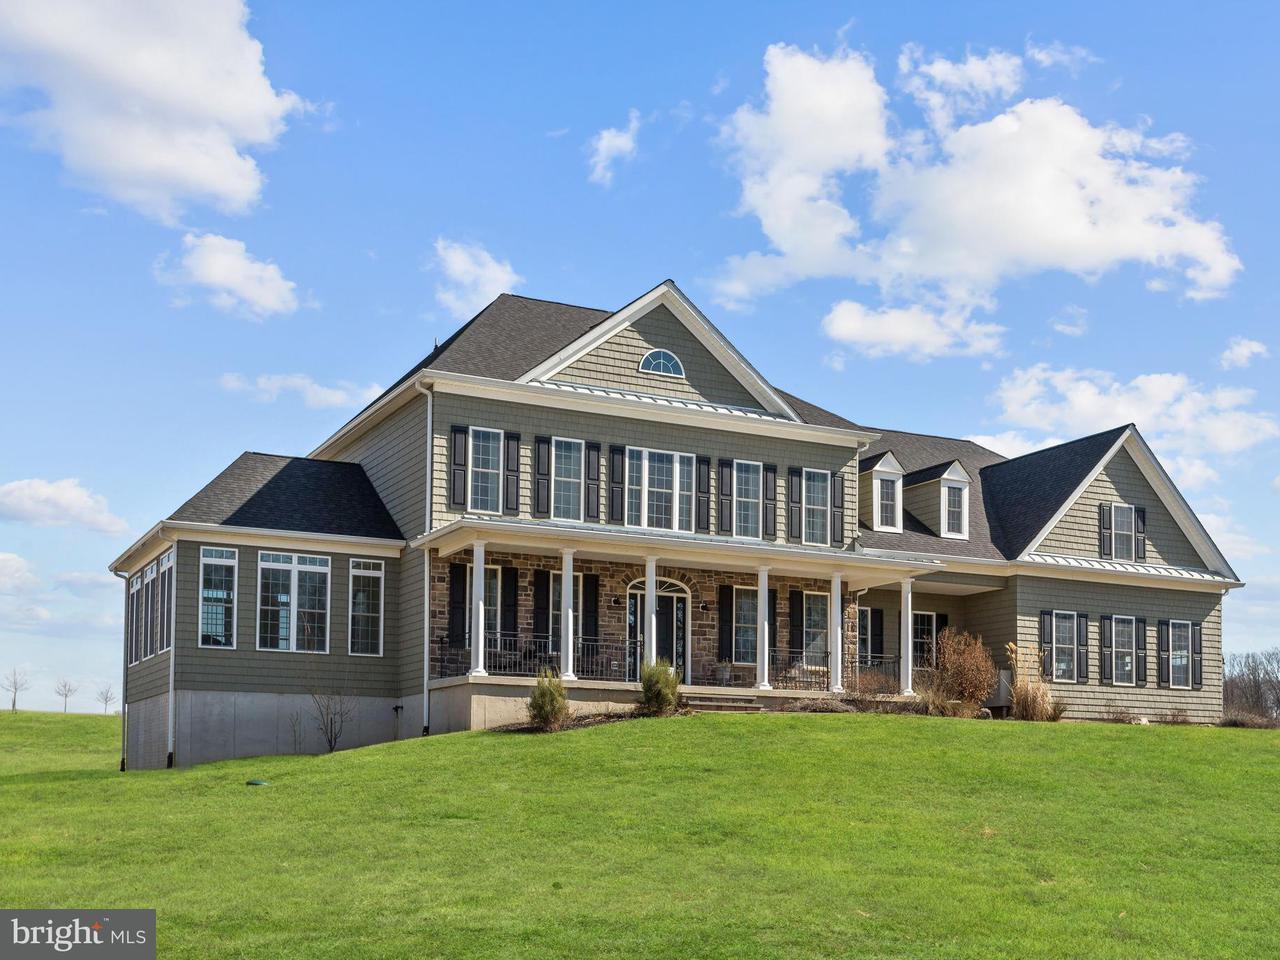 Single Family Home for Sale at 14148 Howard Road 14148 Howard Road Dayton, Maryland 21036 United States